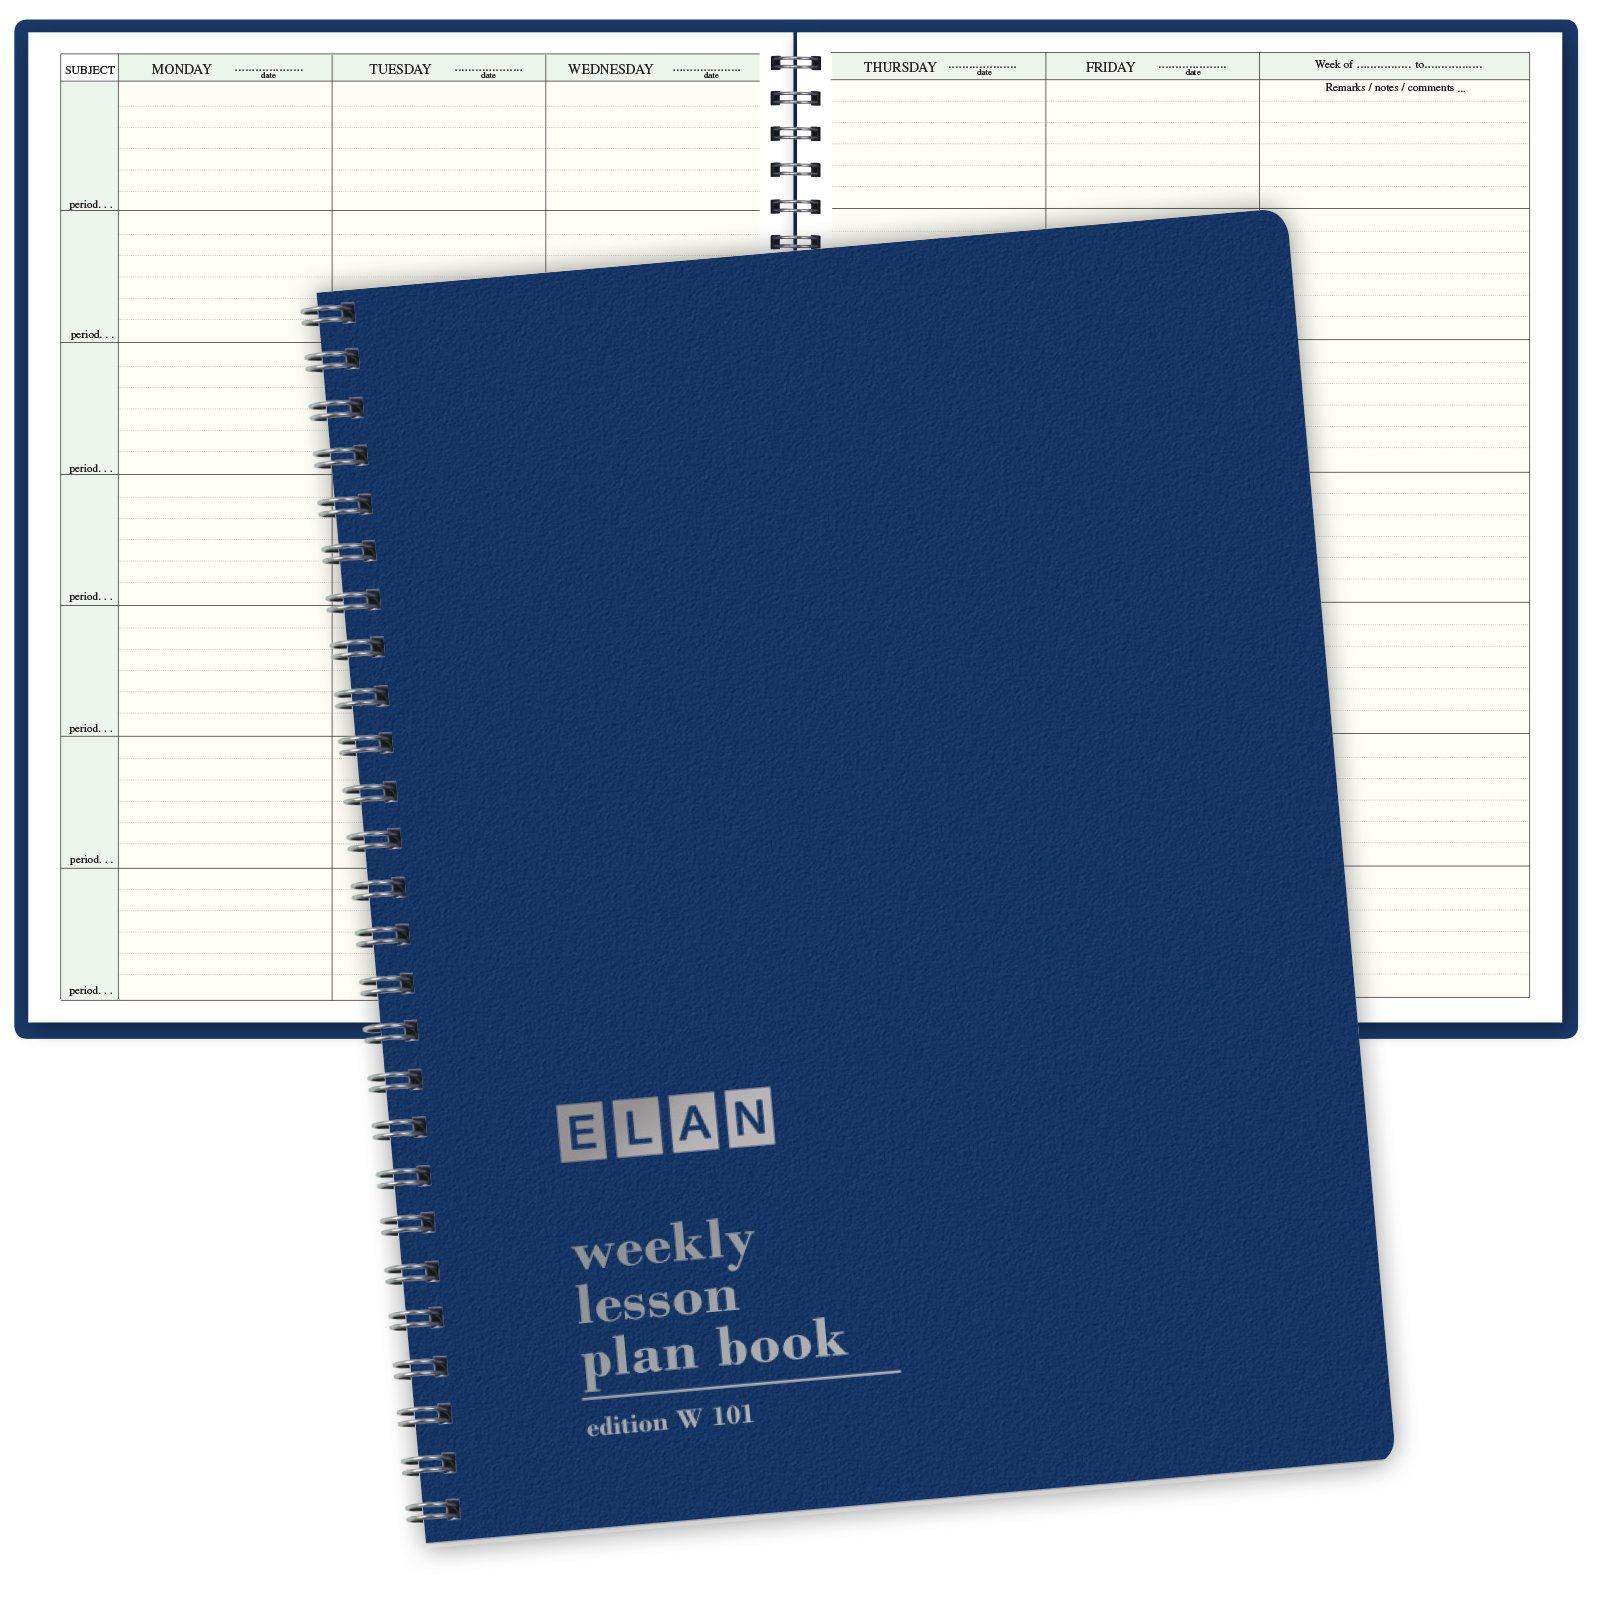 7 Period Teacher Lesson Plan; Days Horizontally Across the Top (W101) by Elan Publishing Company